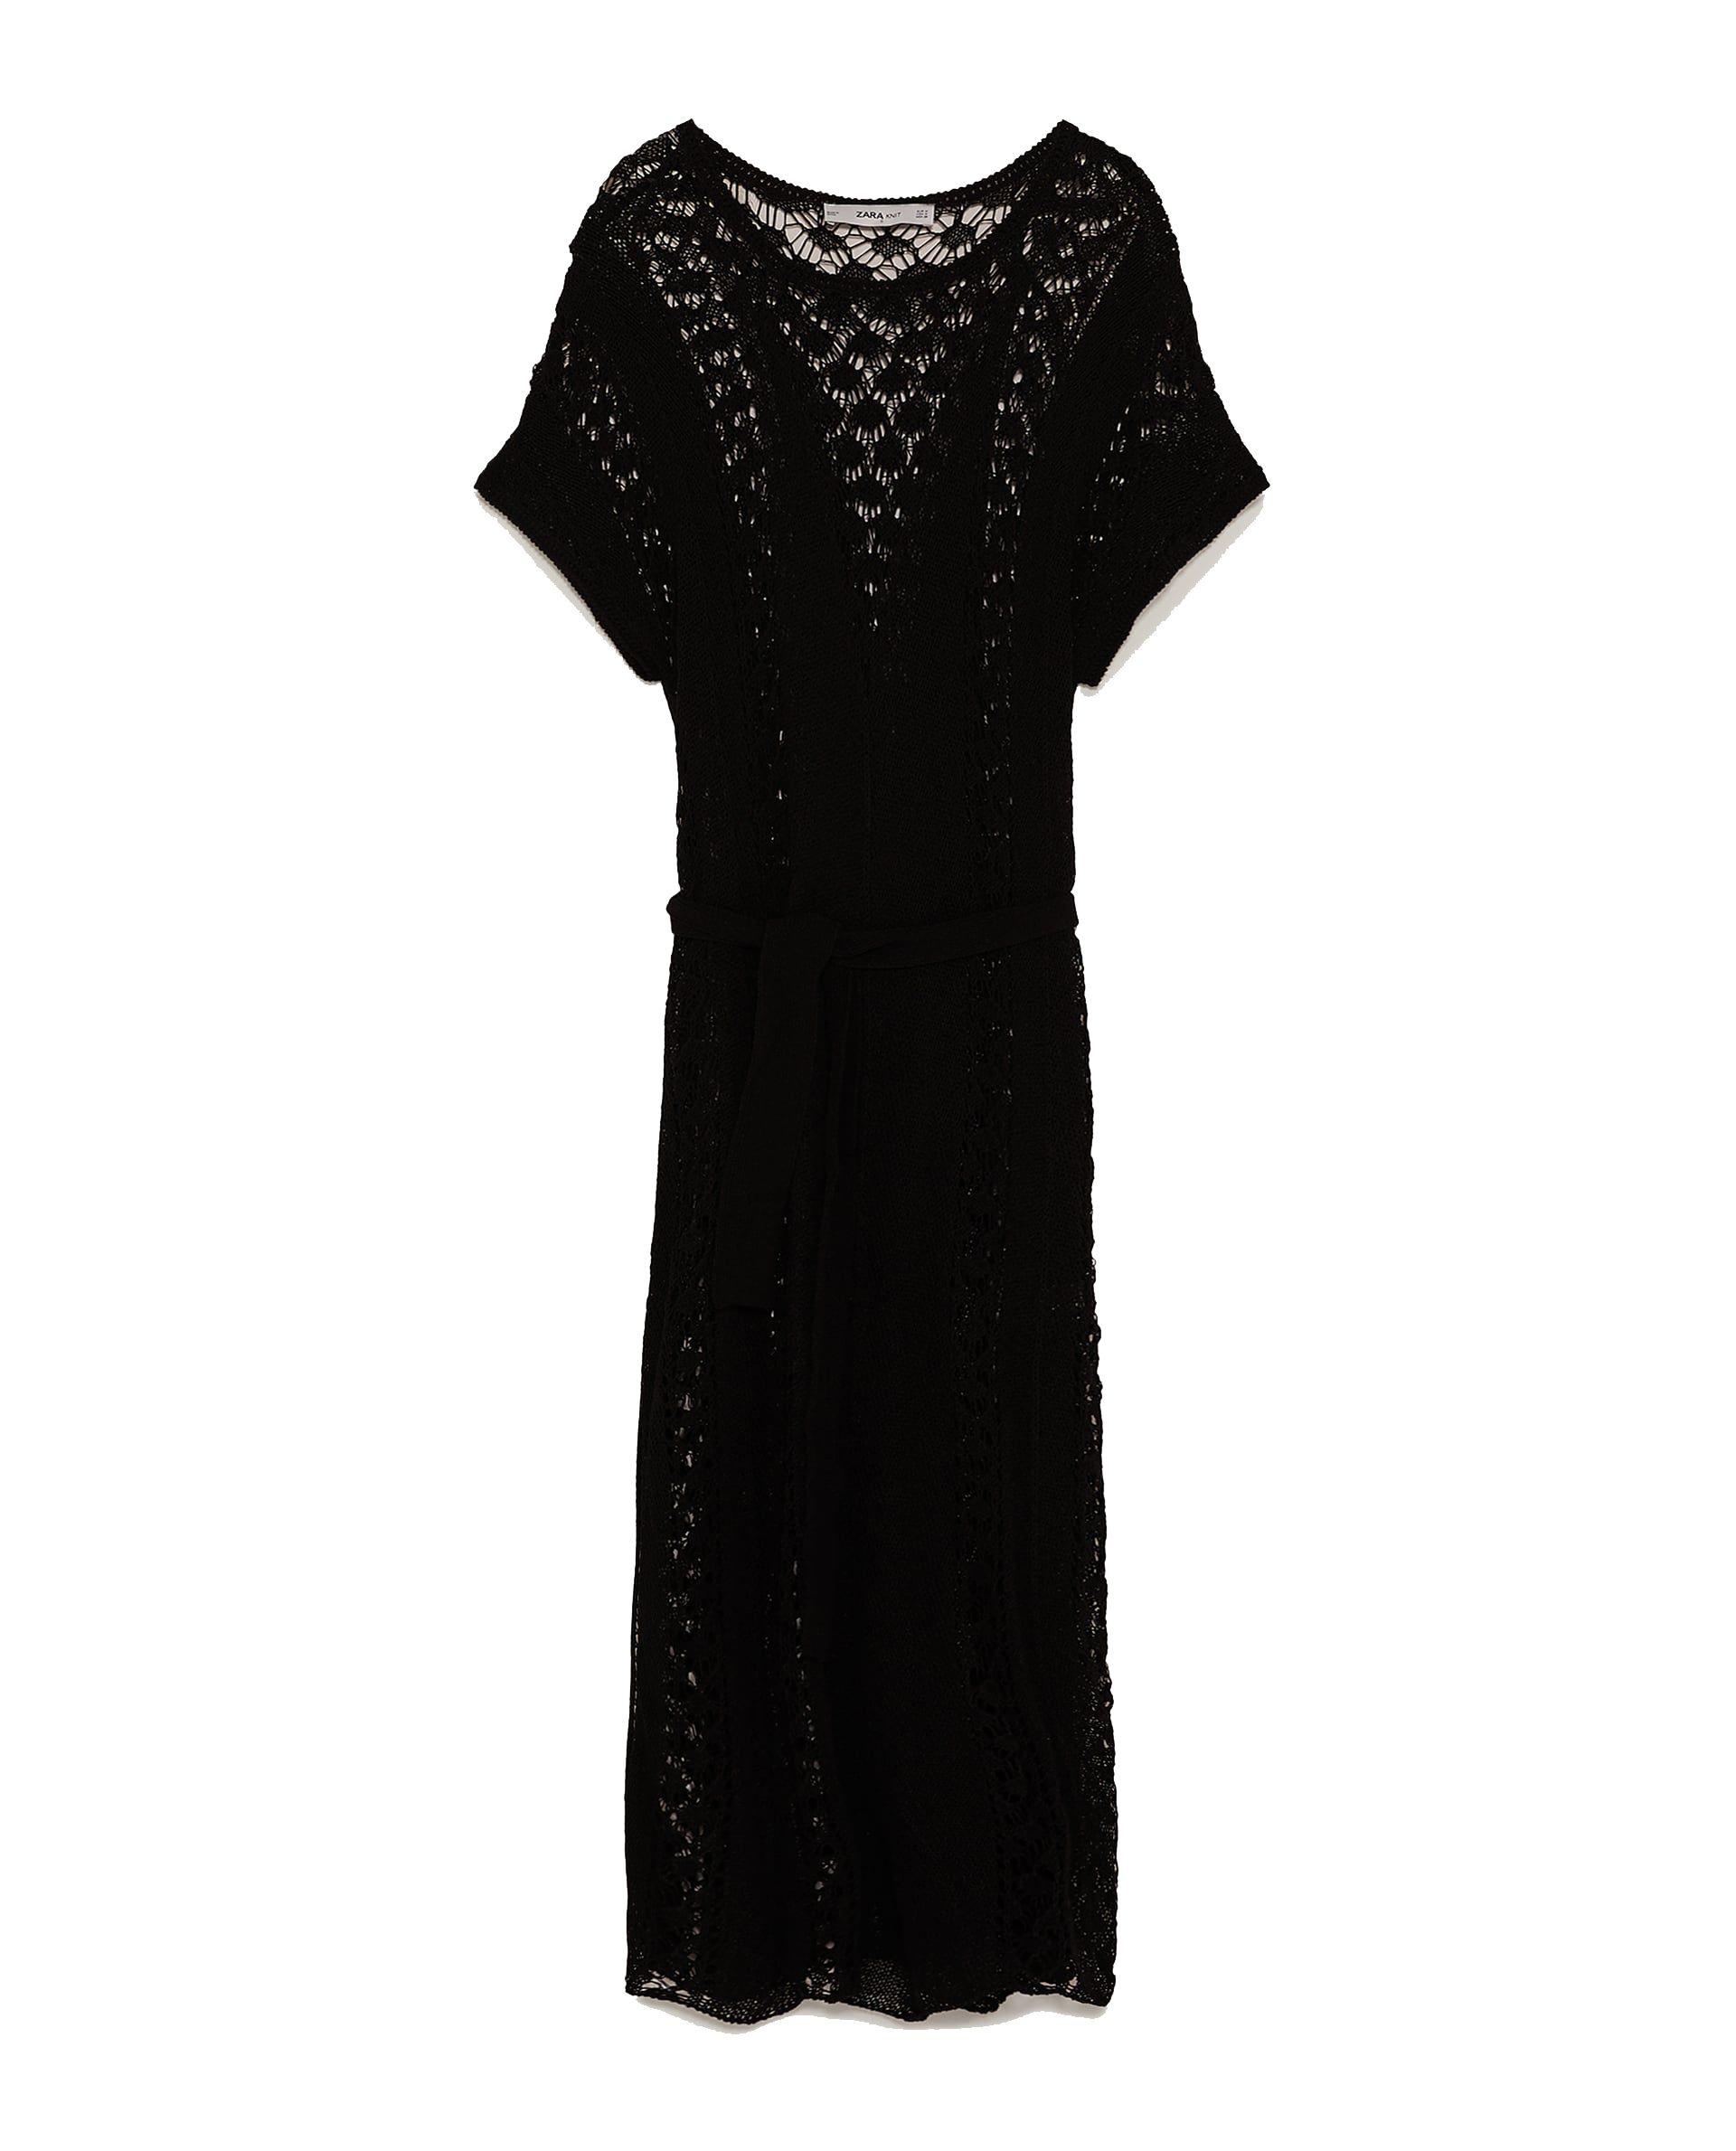 Calado Rebajas Vestido Zara Zara Negro Tallas IdfSwYxY